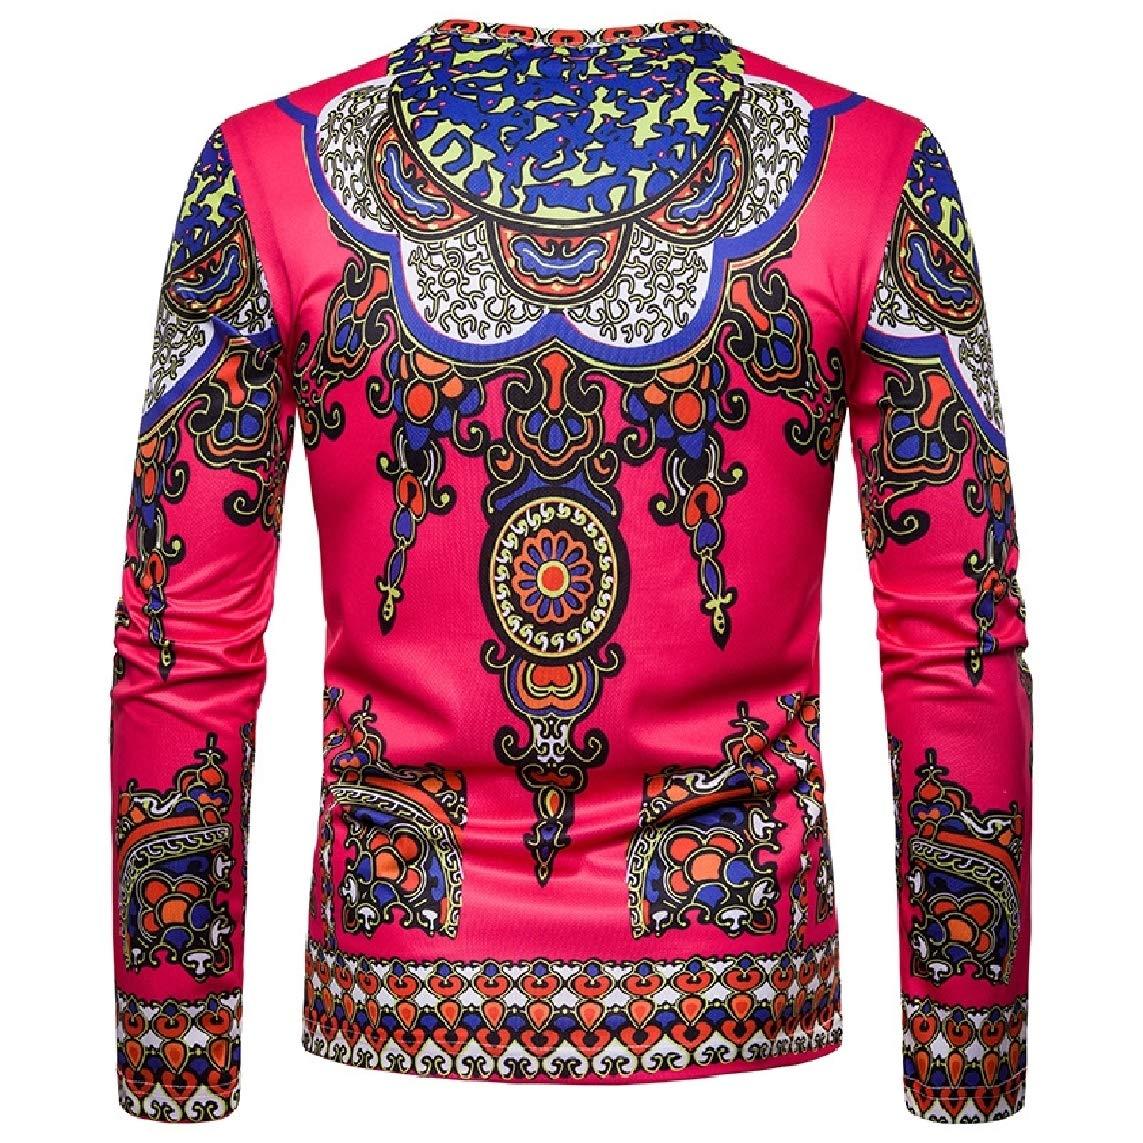 LinkShow Mens Fashion Dashiki African Long-Sleeve Navajo Floral Crew Neck 3D Tees Top